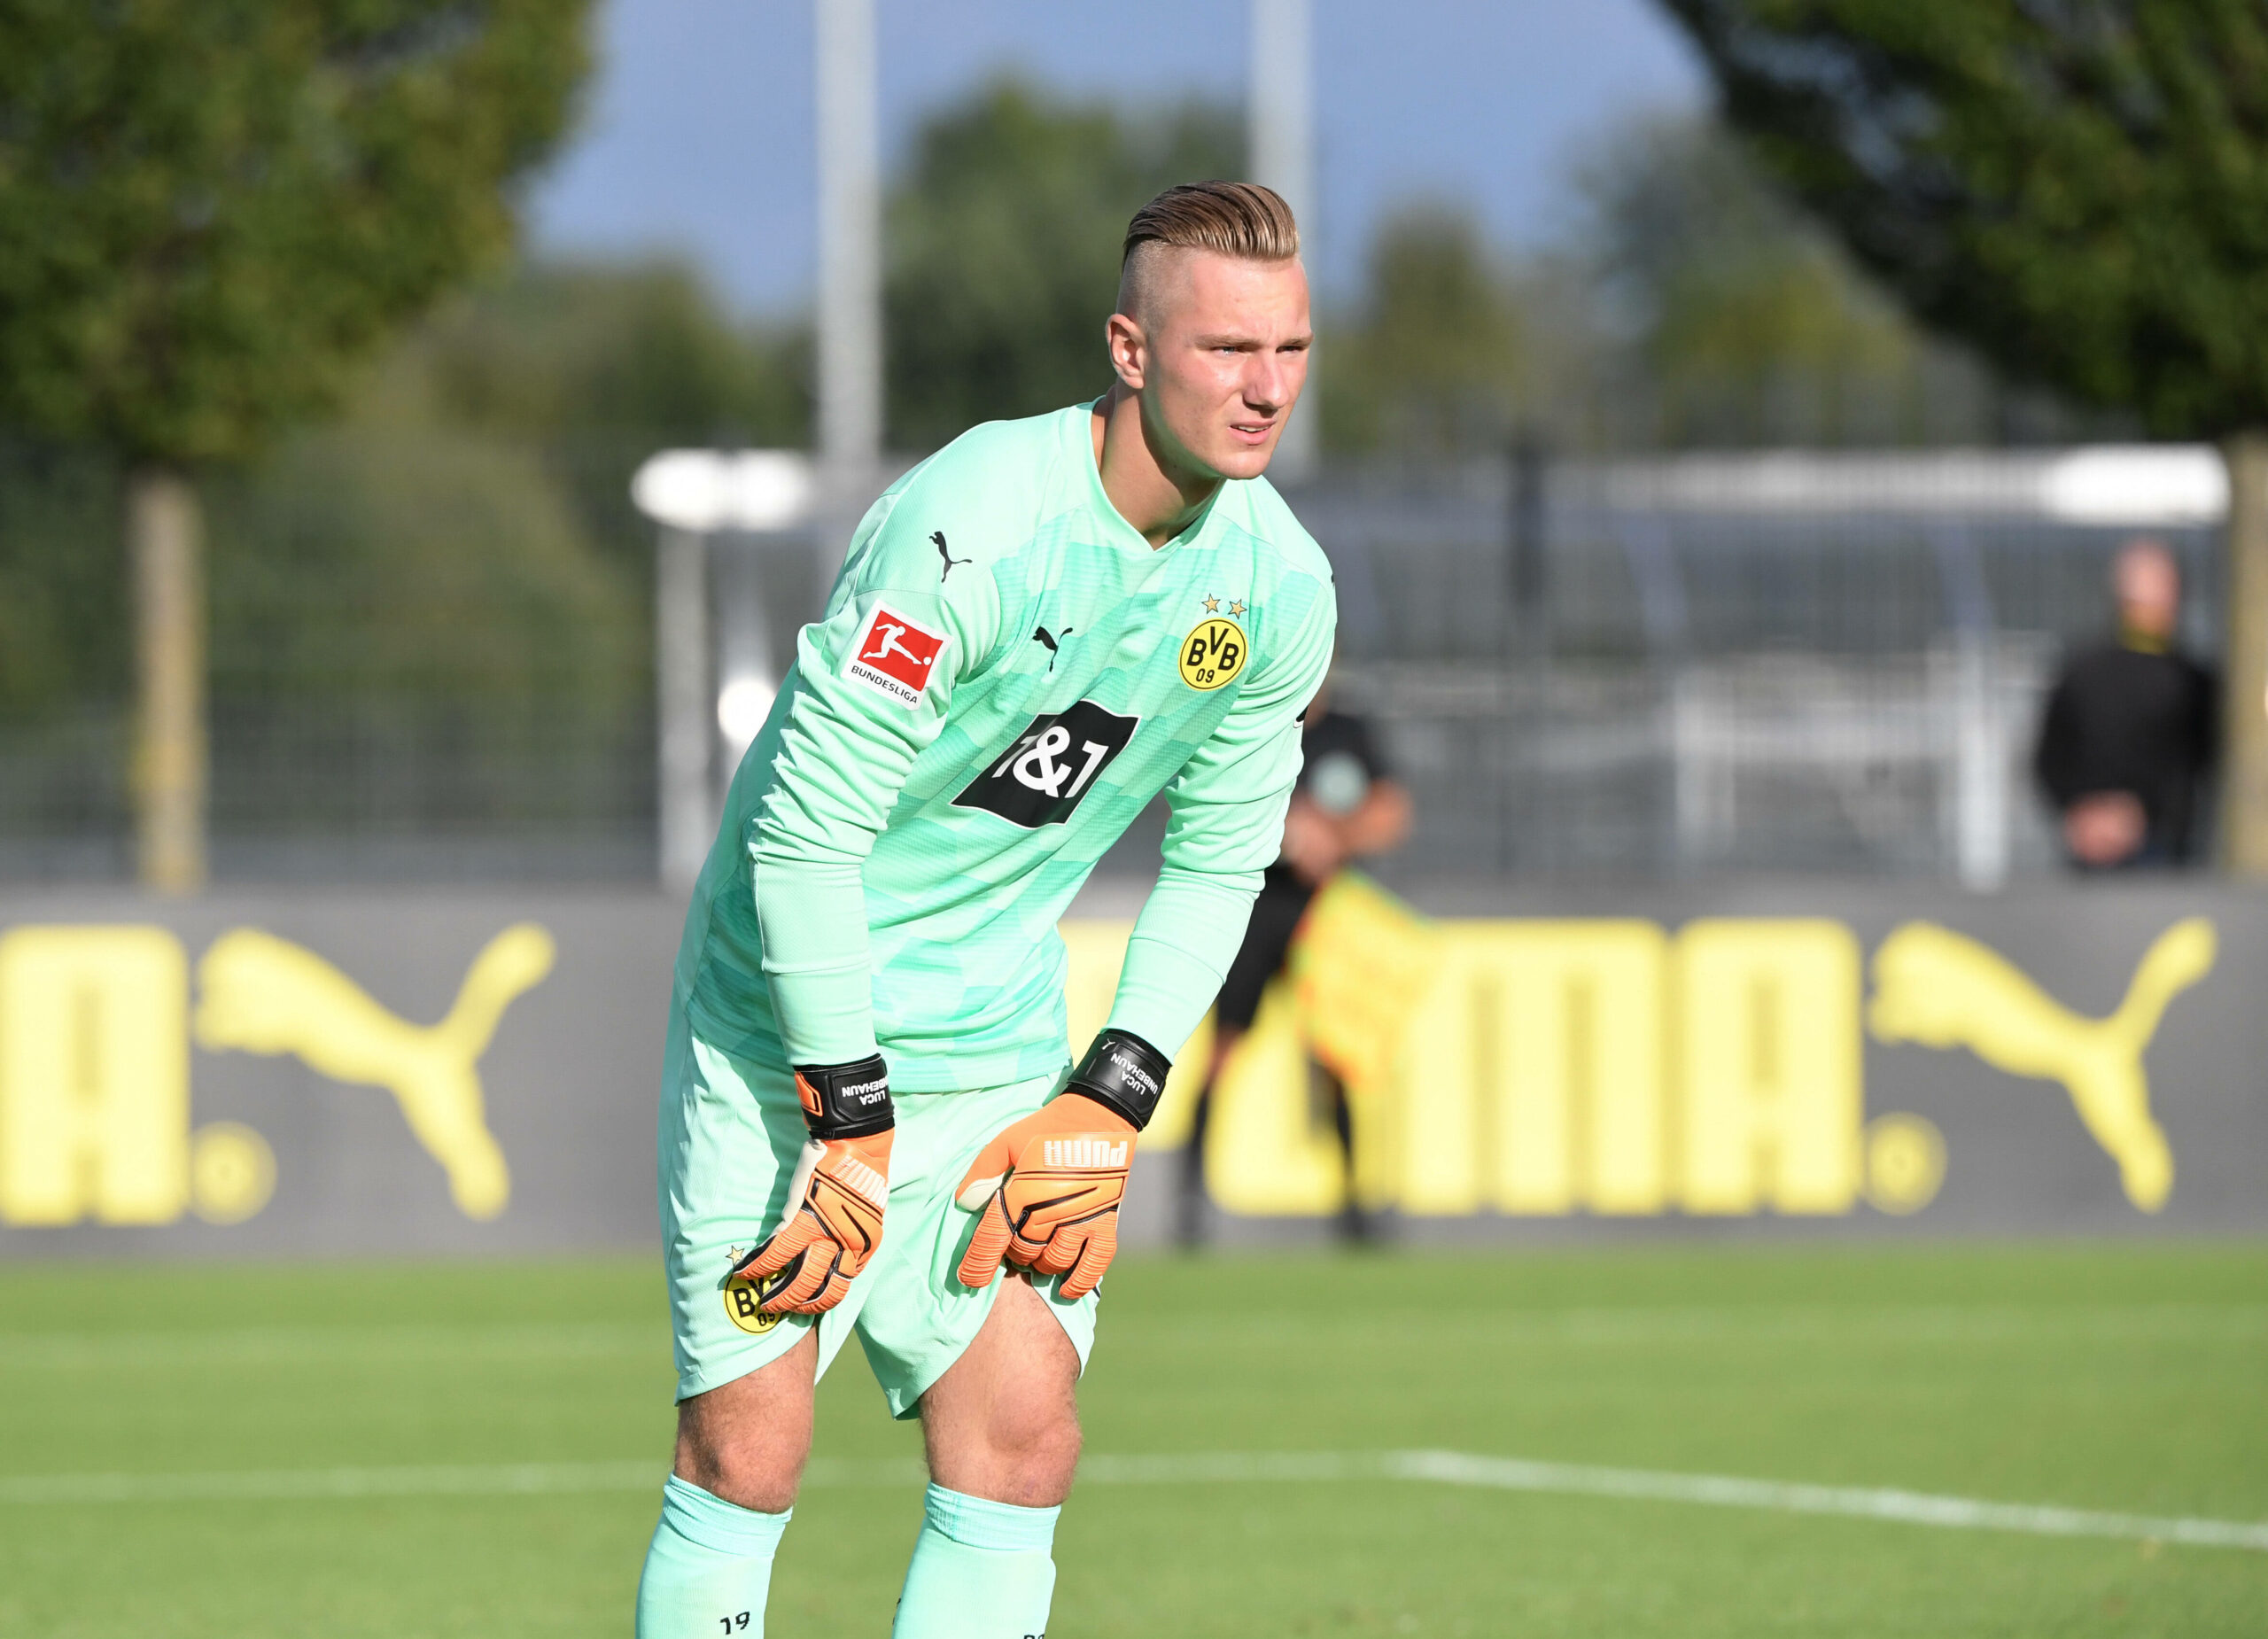 Luca Unbehaun (Borussia Dortmund)